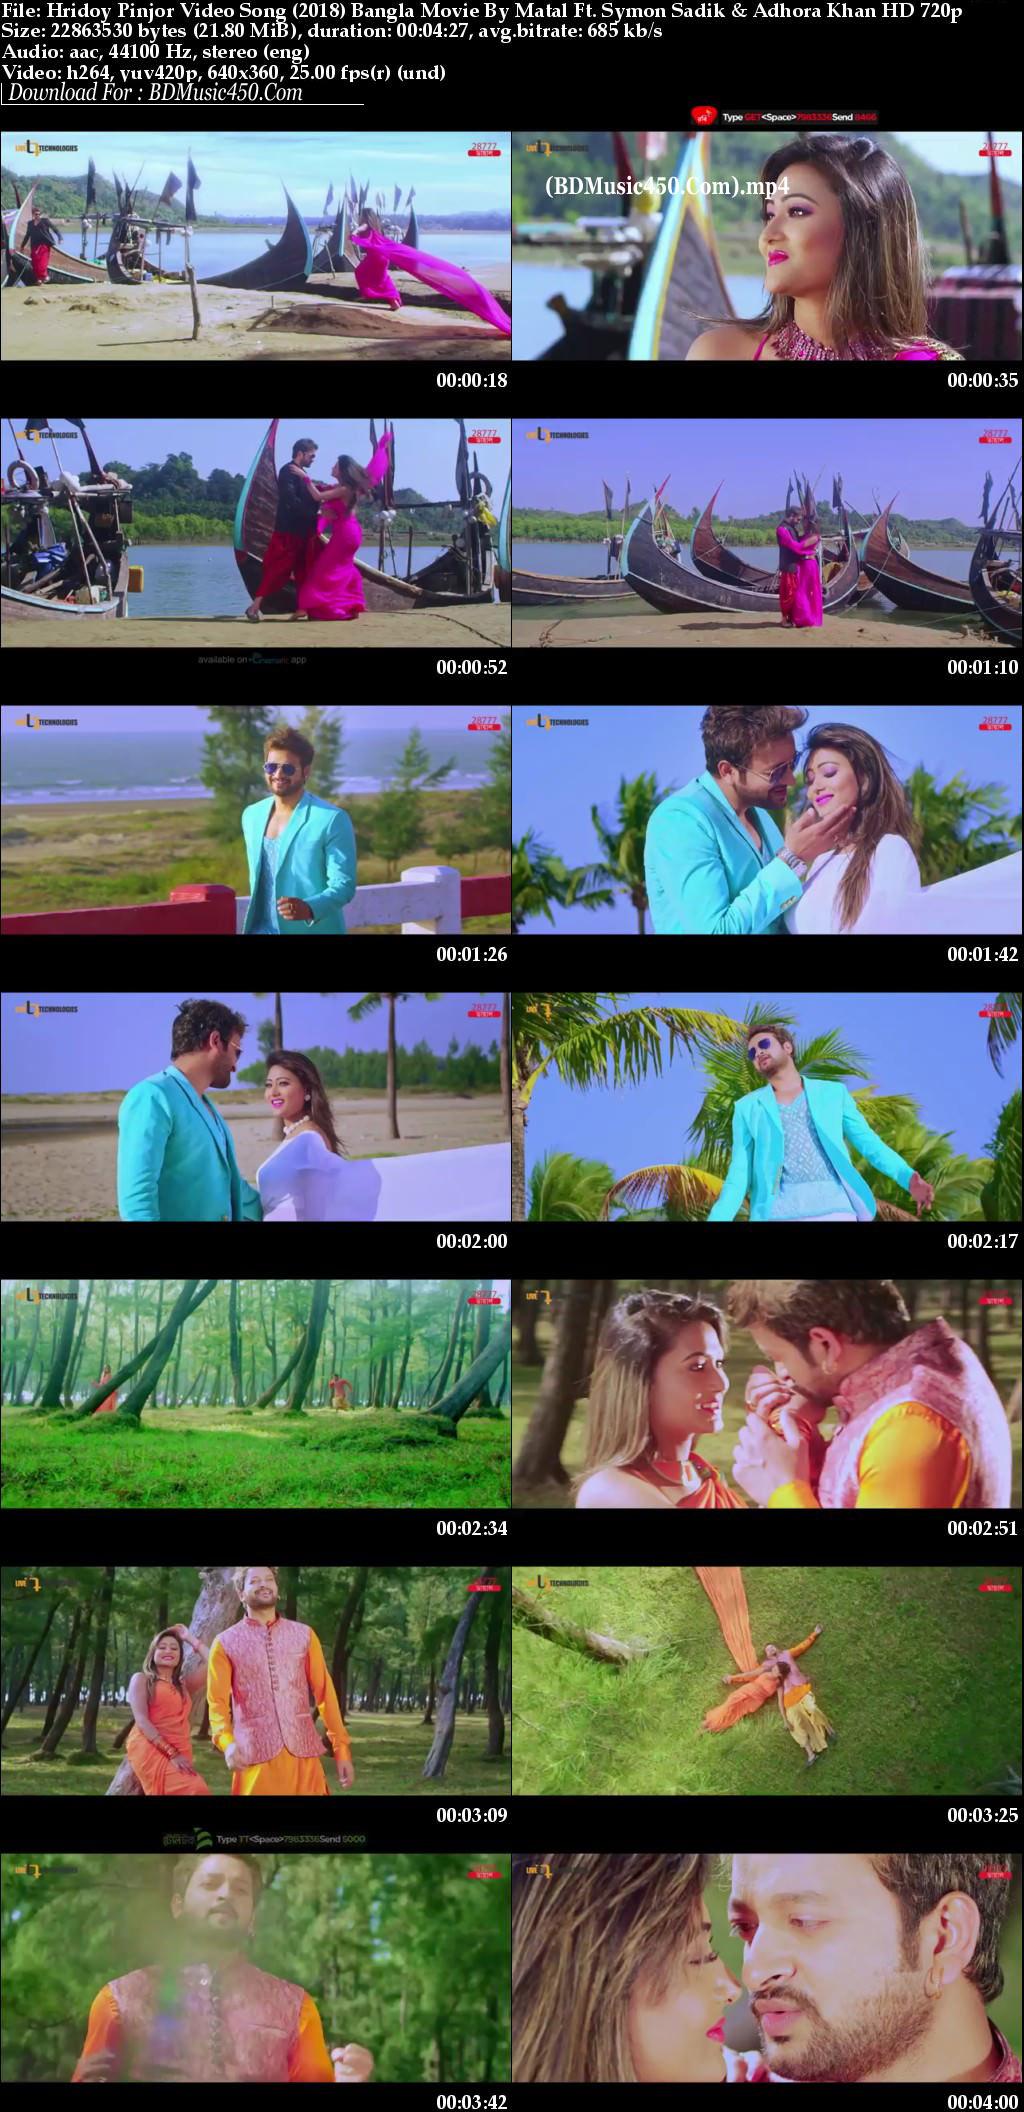 Hridoy Pinjor 2018 Bangla Movie Video Song Matal By. Symon Sadik & Adhora Khan HD